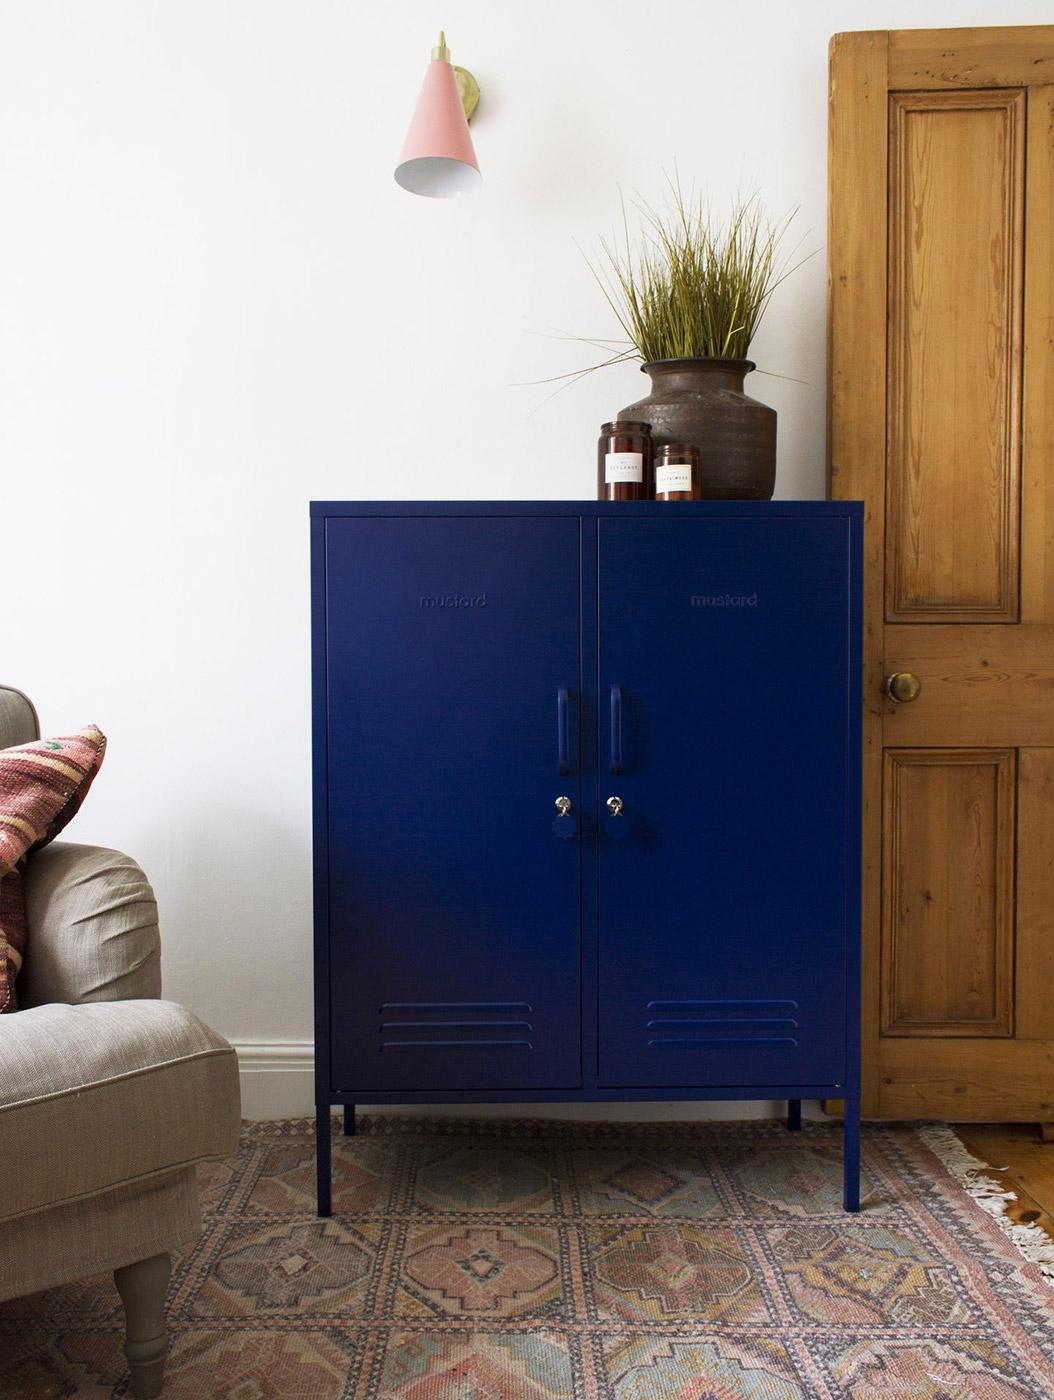 Midi storage cupboard - locker in navy blue